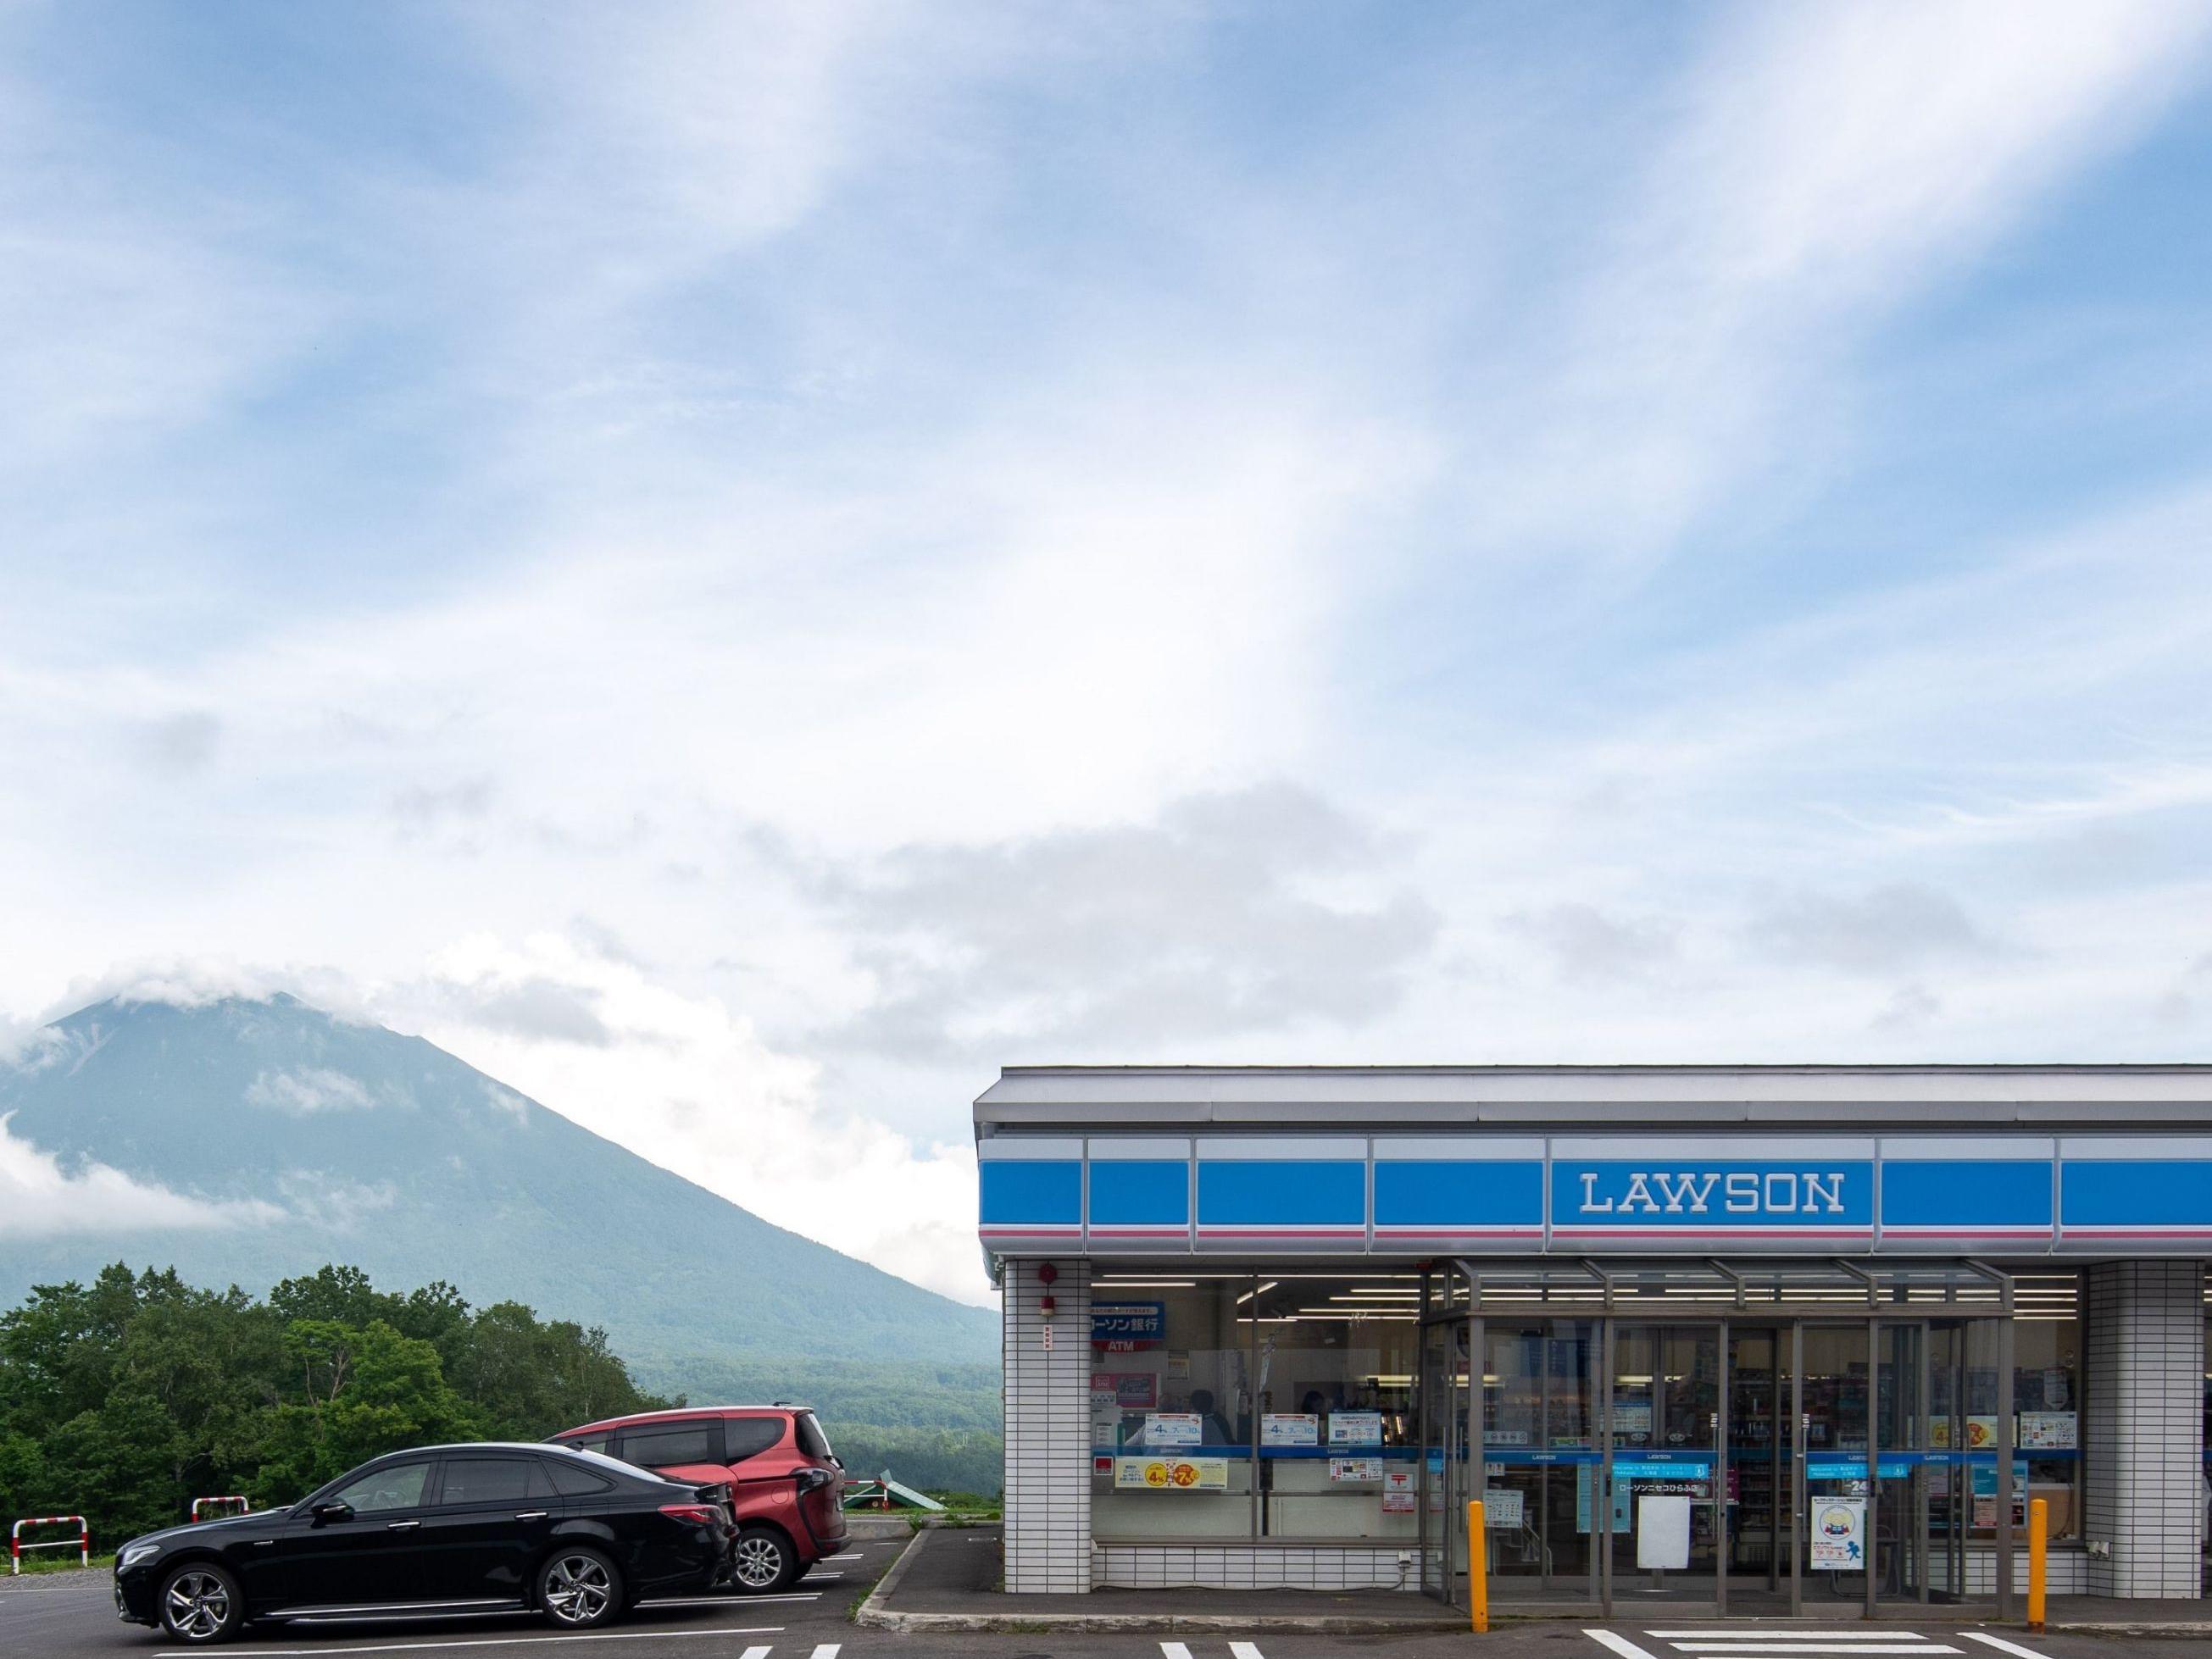 Hirafu convenience stores near Chatrium Niseko Japan